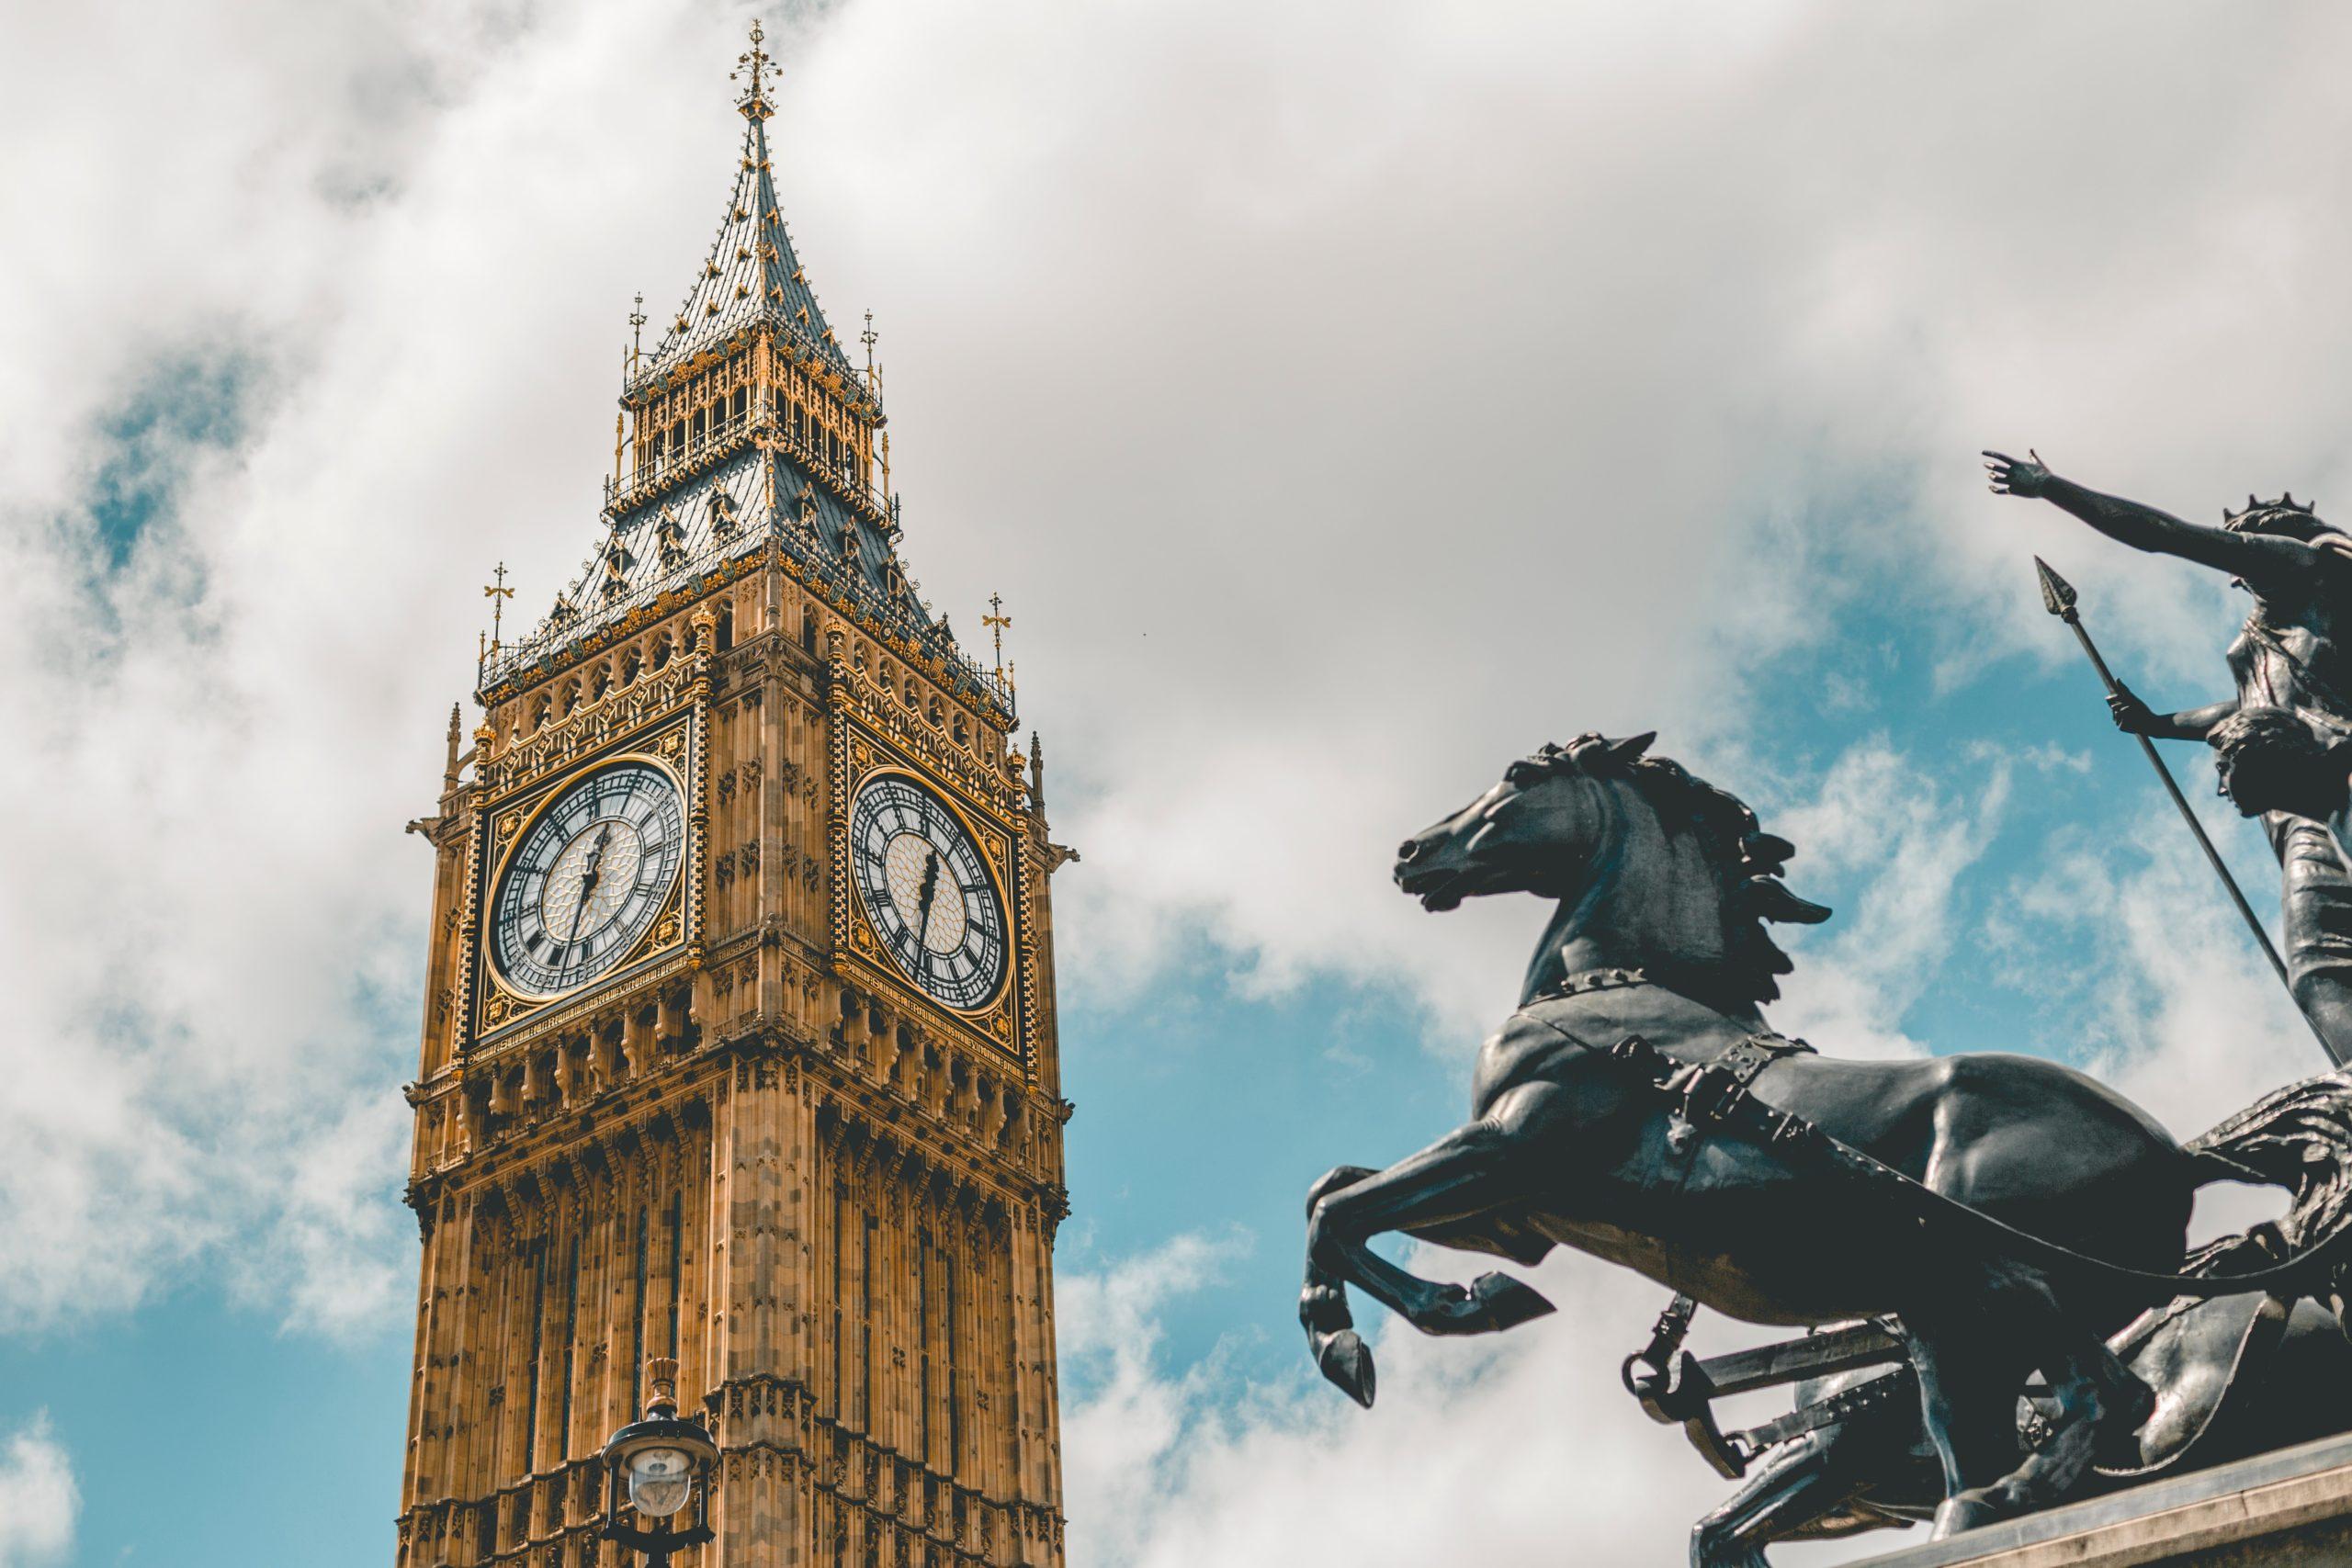 big-ben-londyn-angielski-drenglish